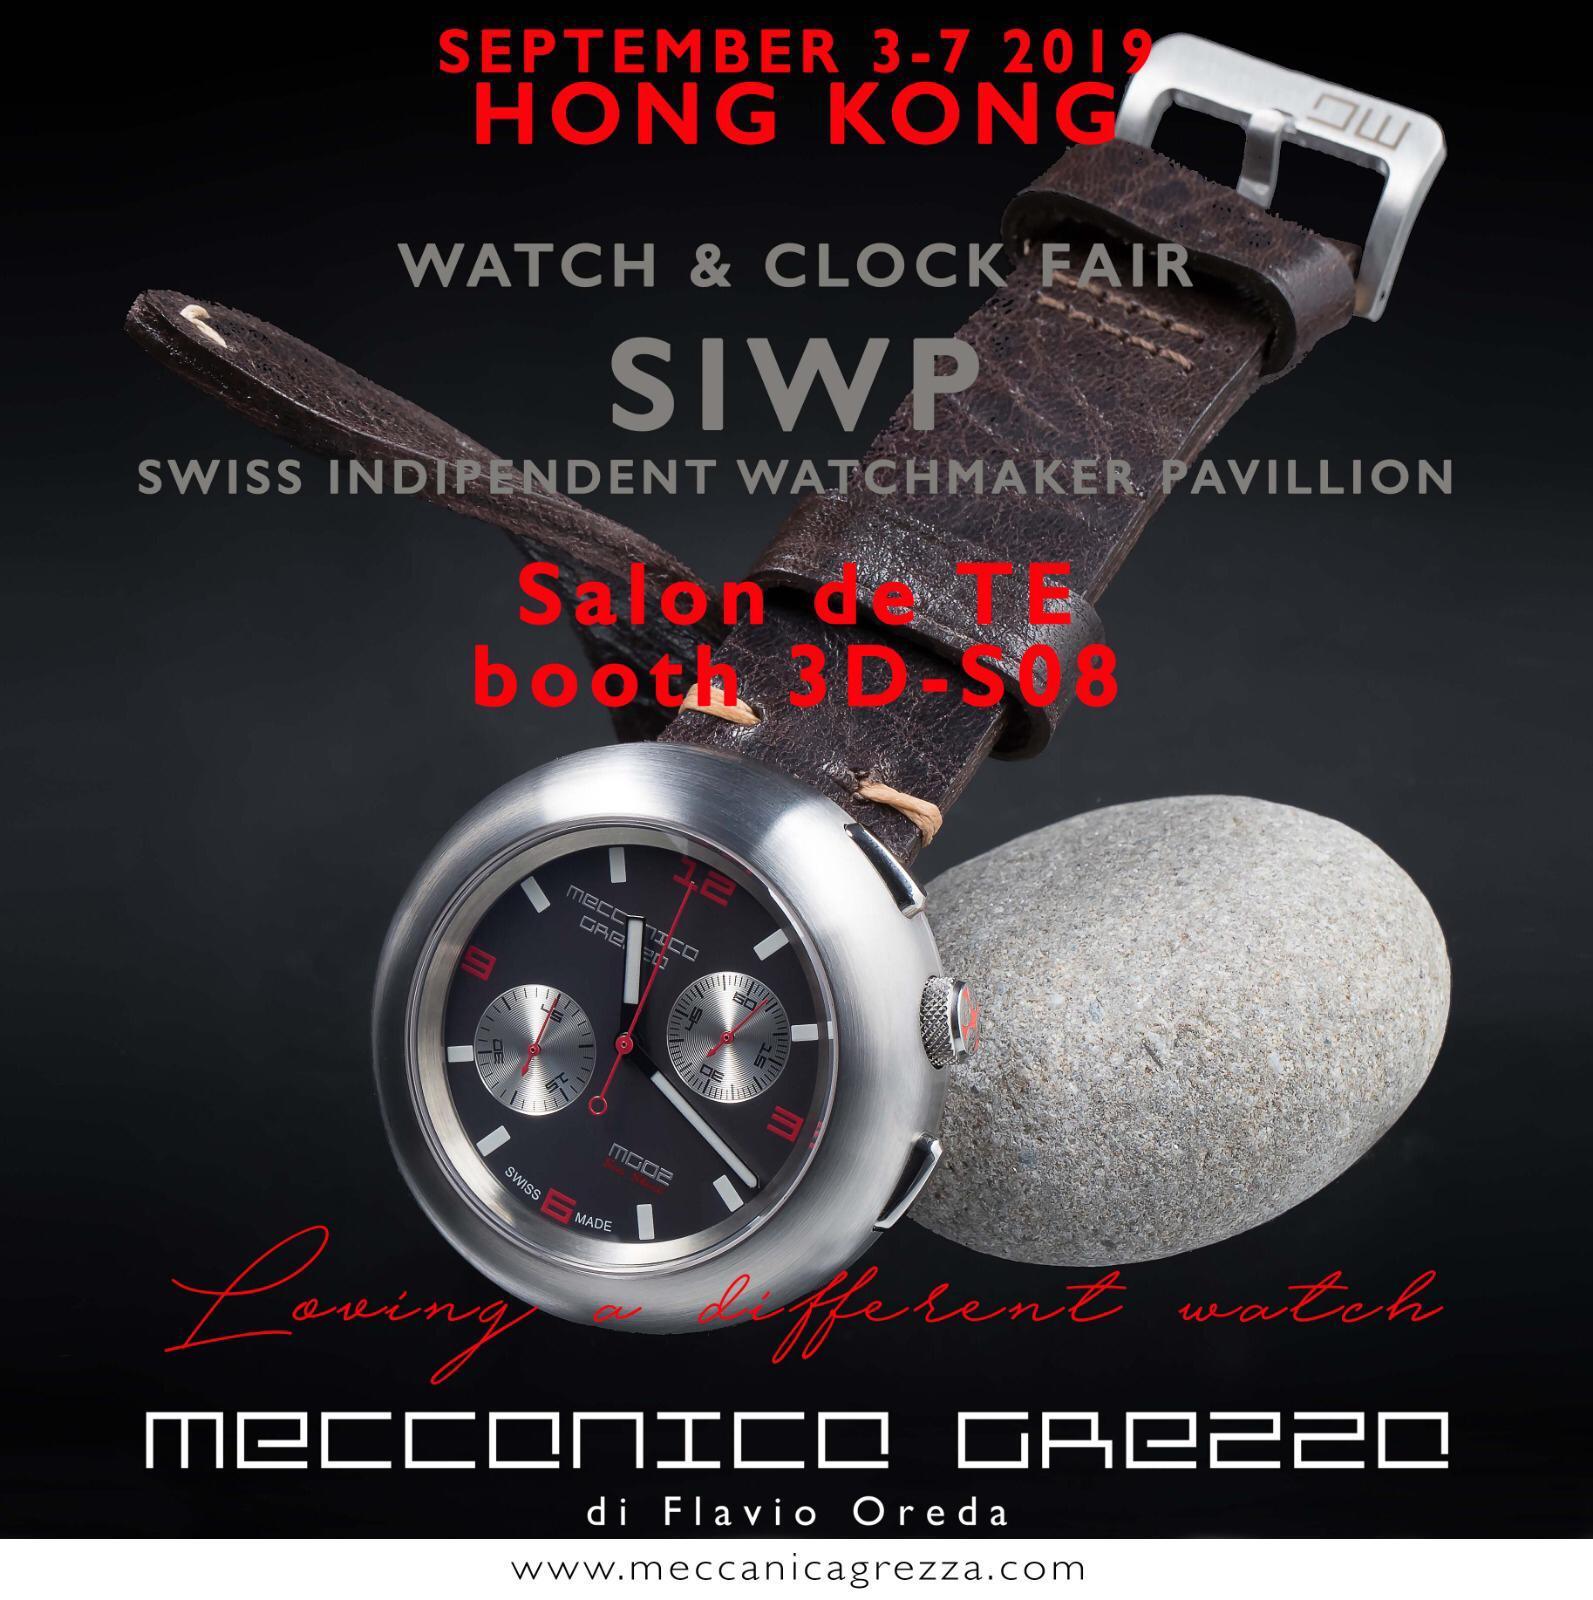 Meccanica Grezza at Watch & Clock Fair 2019 | Hong Kong - MondaniWeb